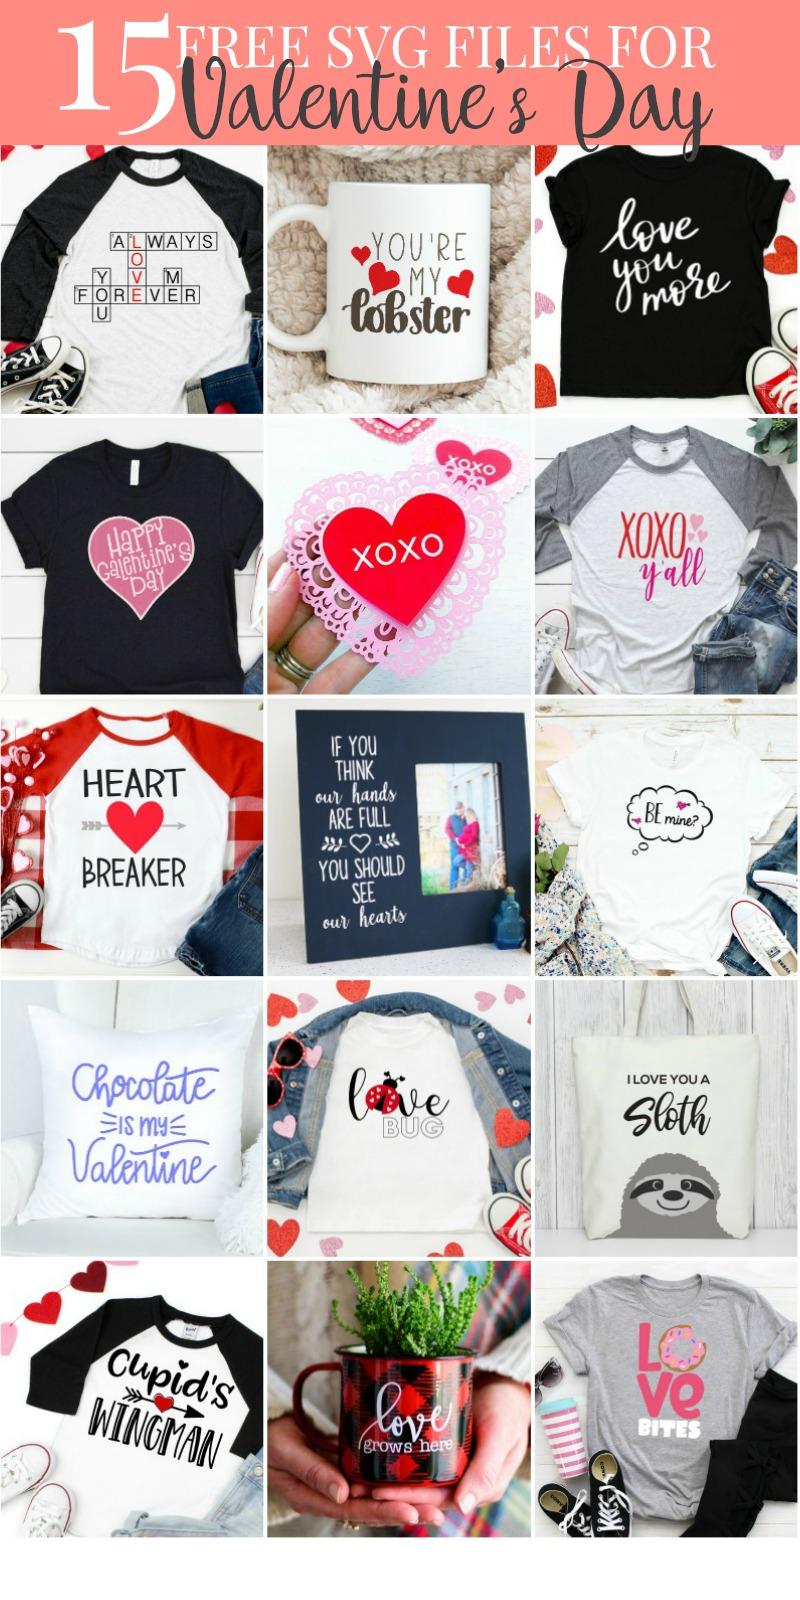 Valentine's Day SVG Files